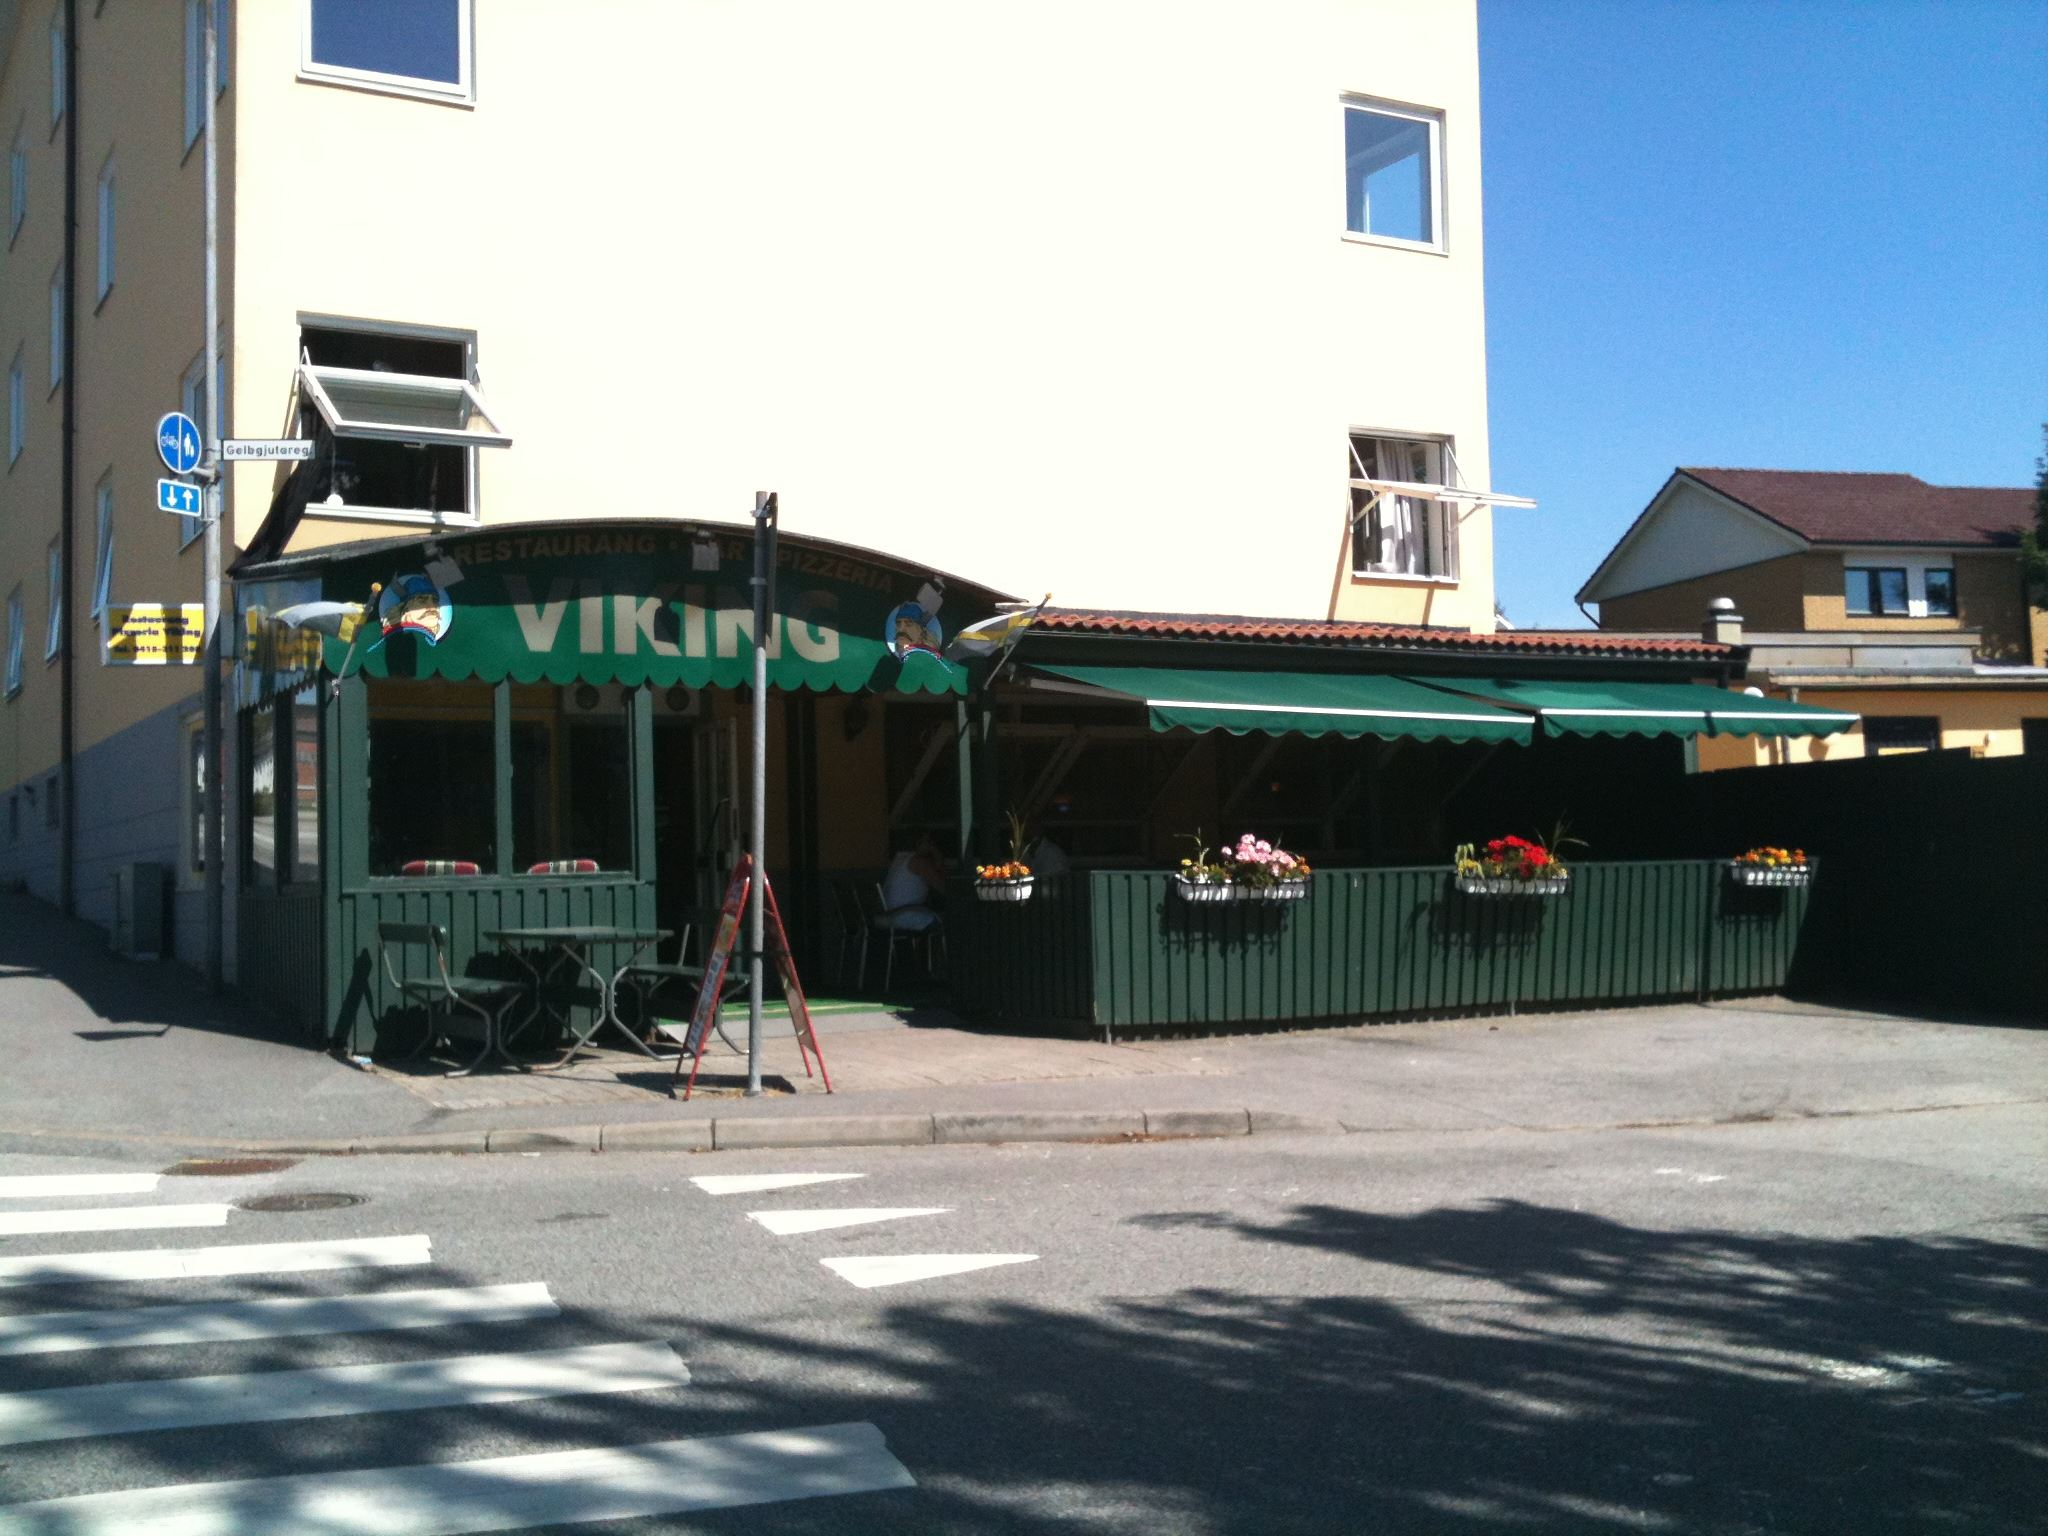 Turistbyrån, Viking Pizzeria